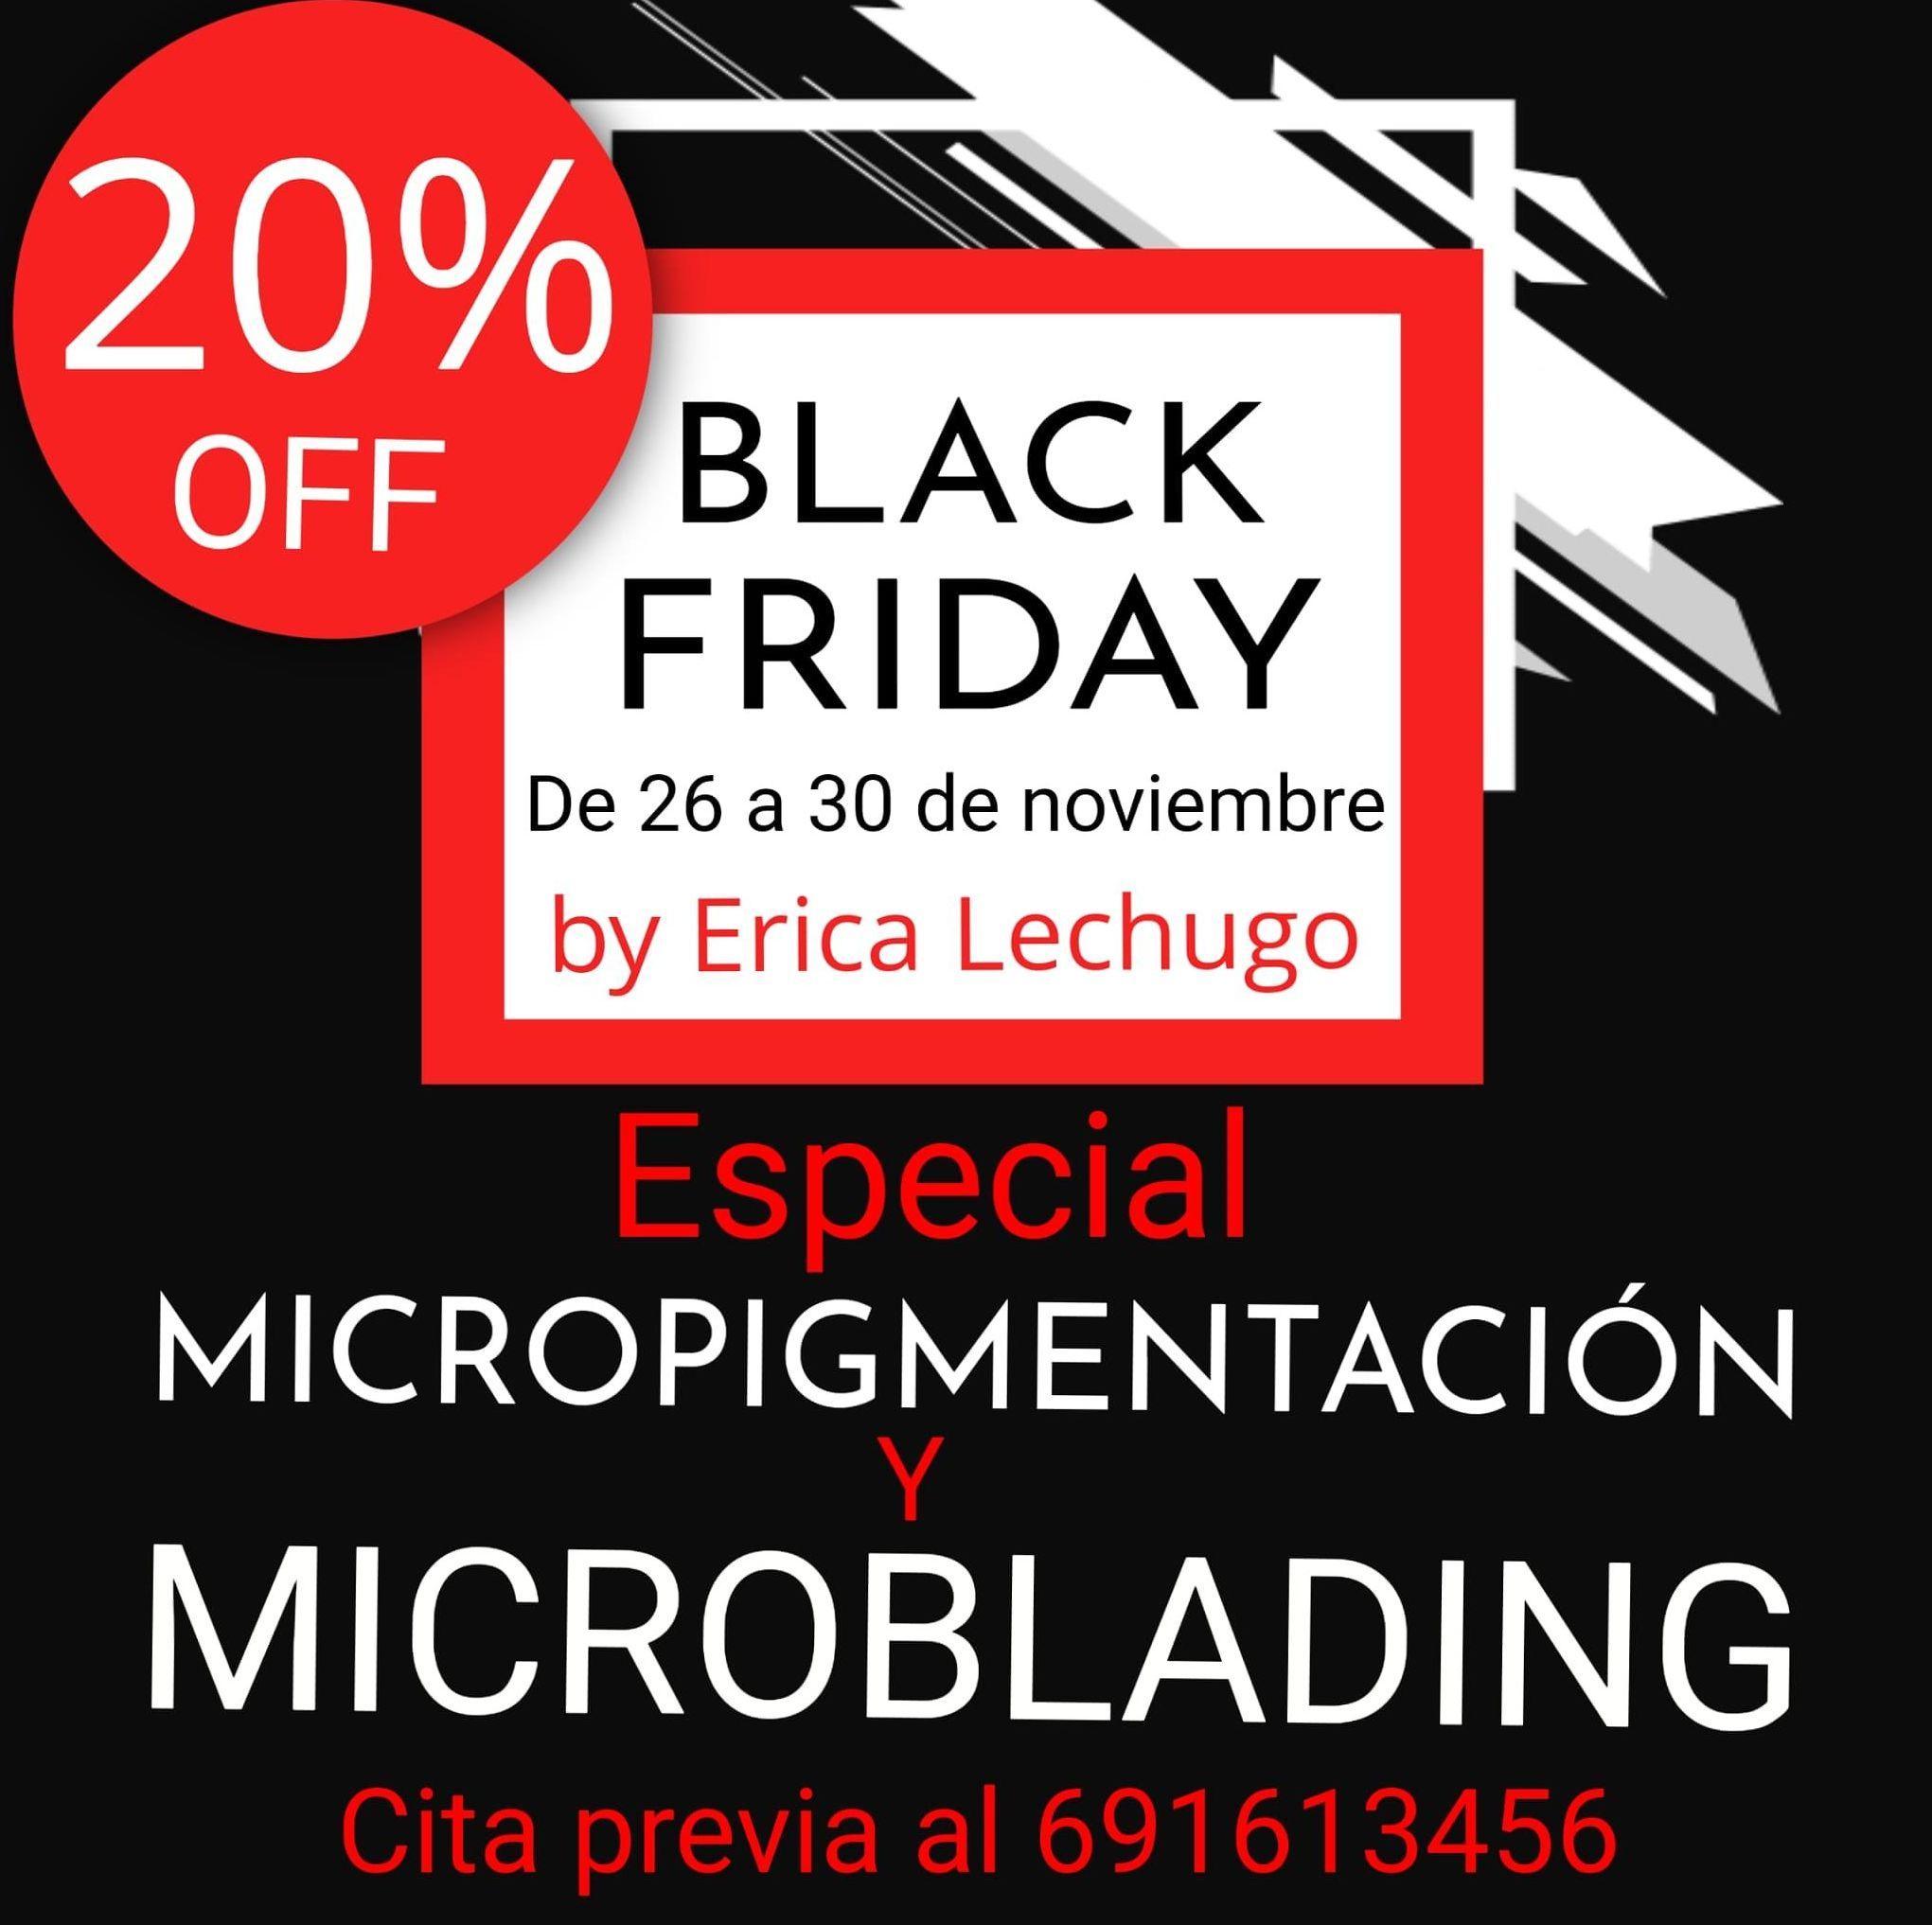 Black Friday Microblading